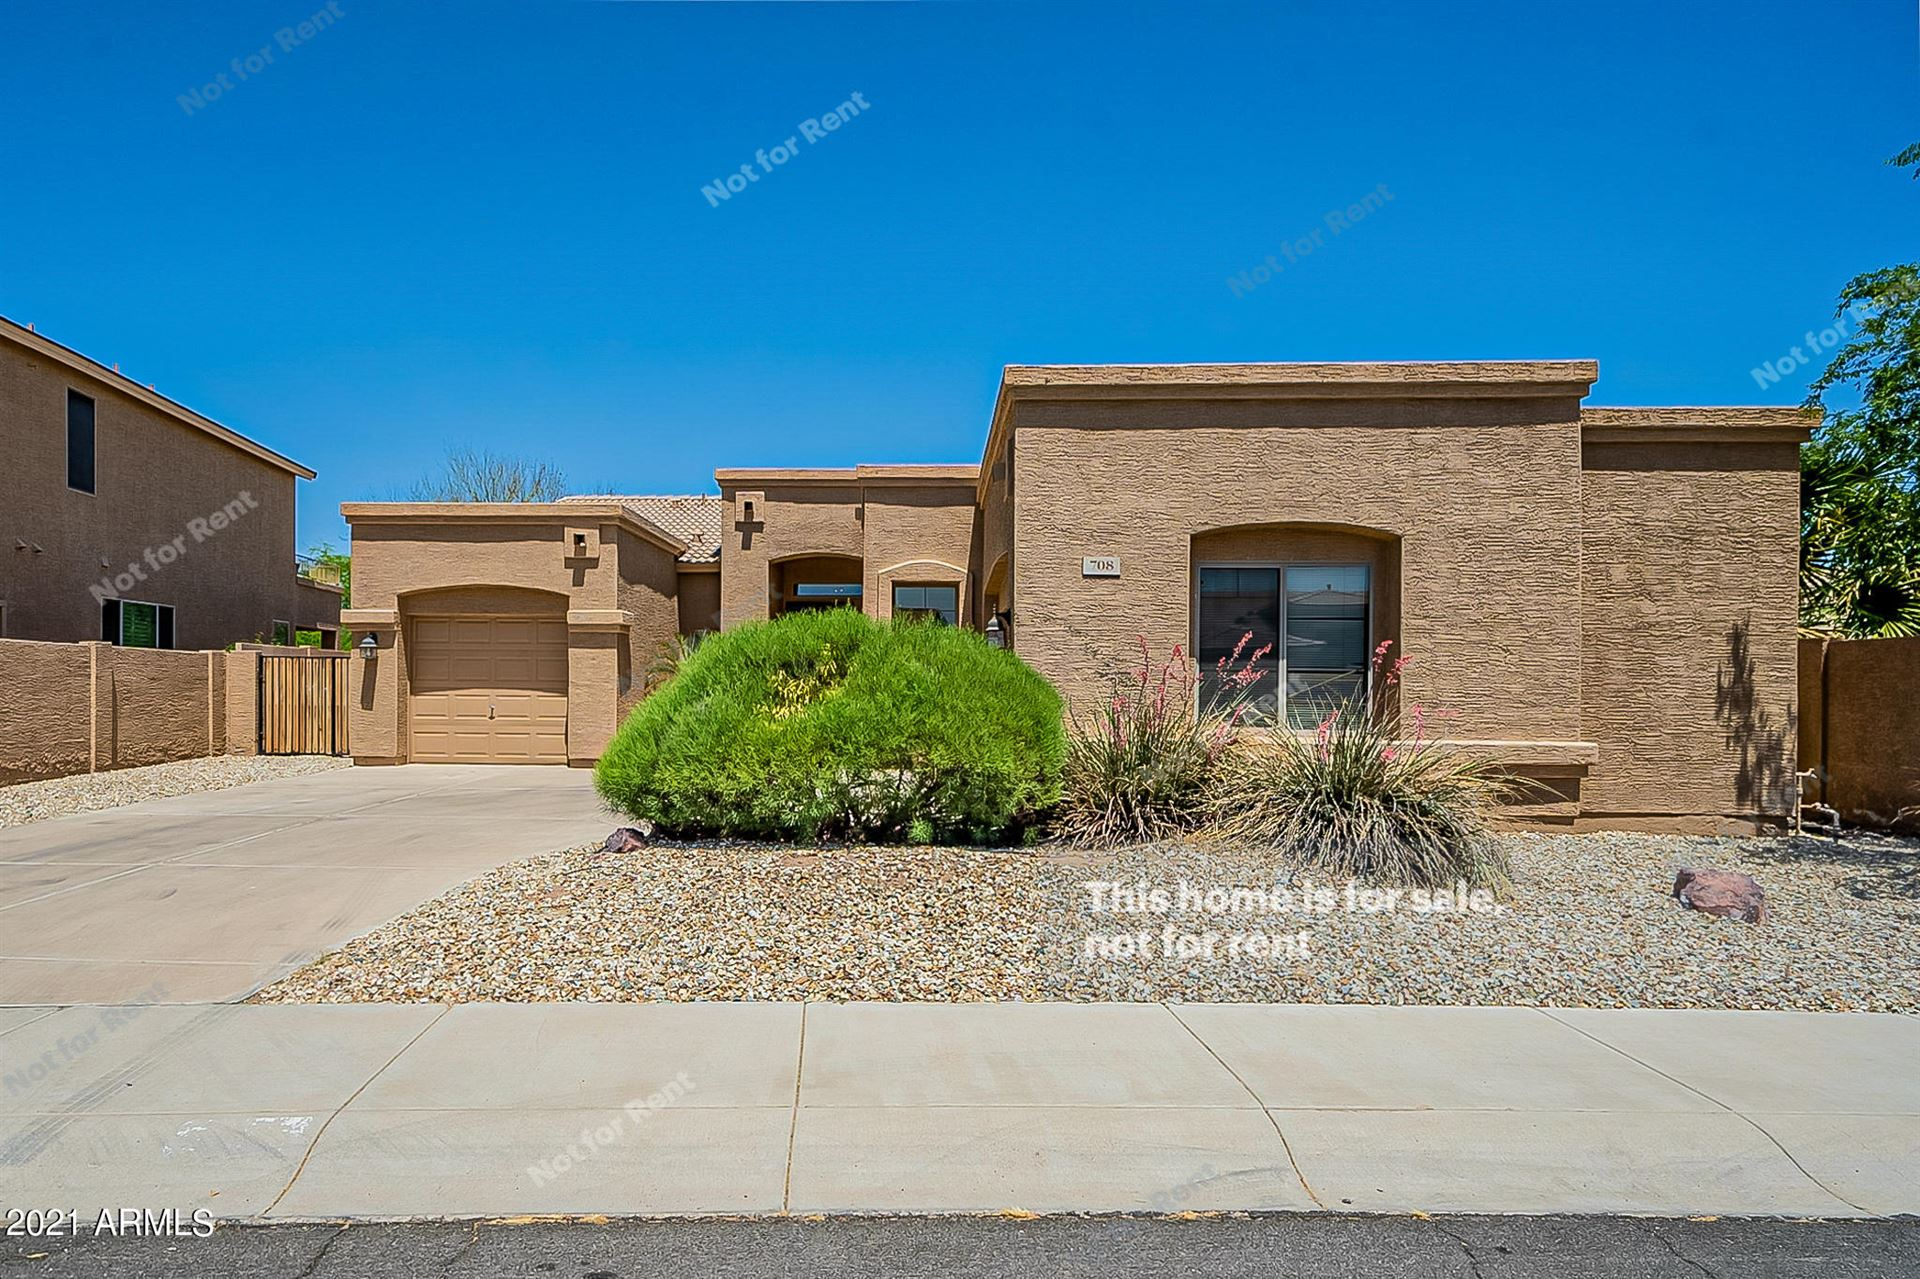 Photo of 708 W CITRUS Way, Chandler, AZ 85248 (MLS # 6234289)